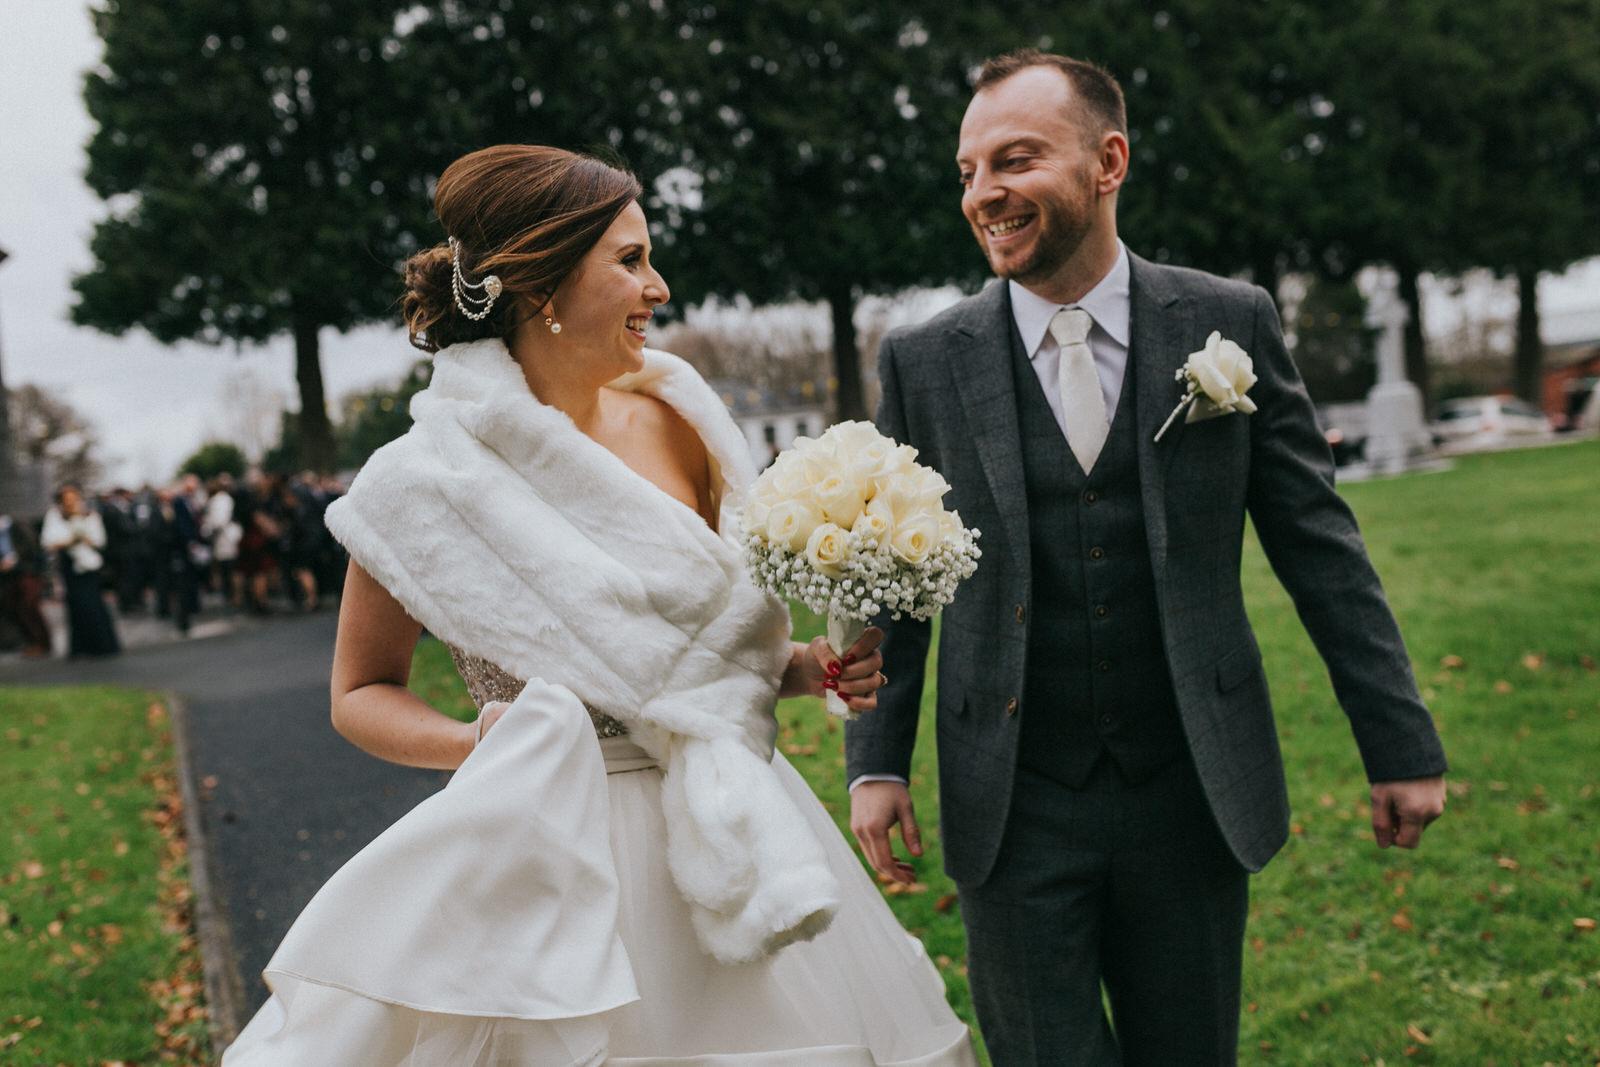 Clonabreany_wedding-photographer_roger_kenny_ireland_059.jpg